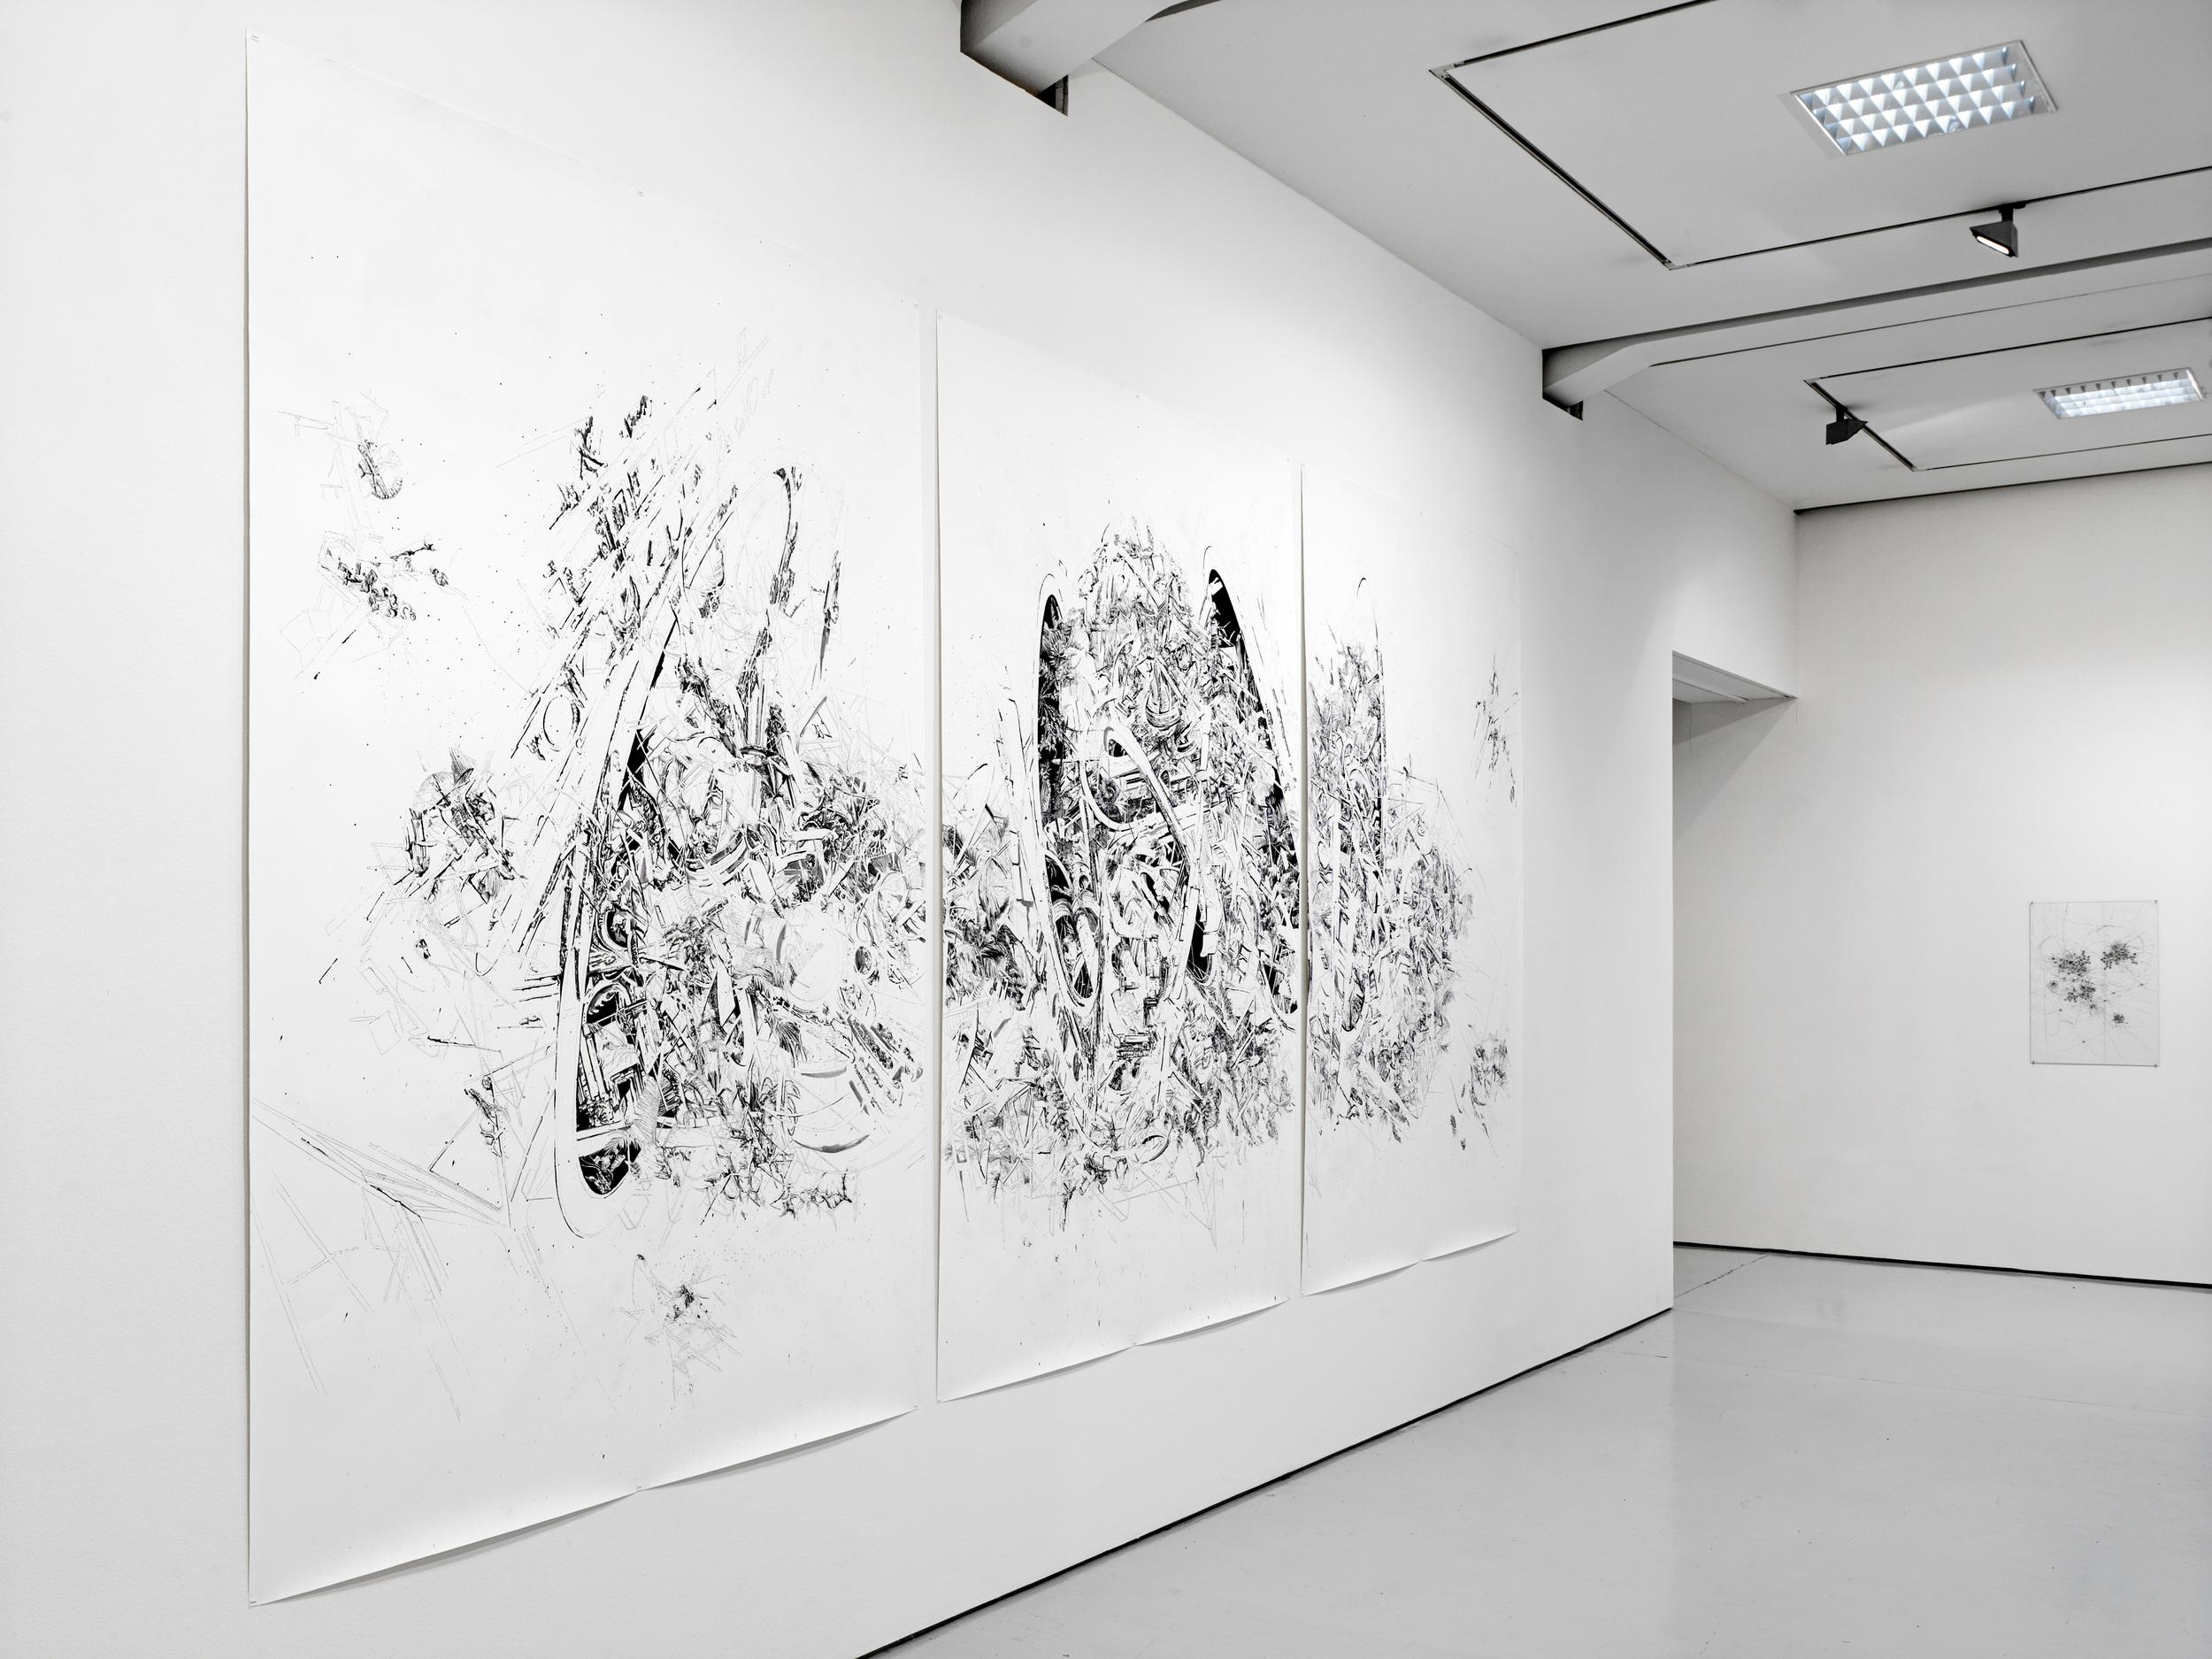 exhibitionView_drawing_a_universe_Kai10_Düsseldorf_2013.jpg